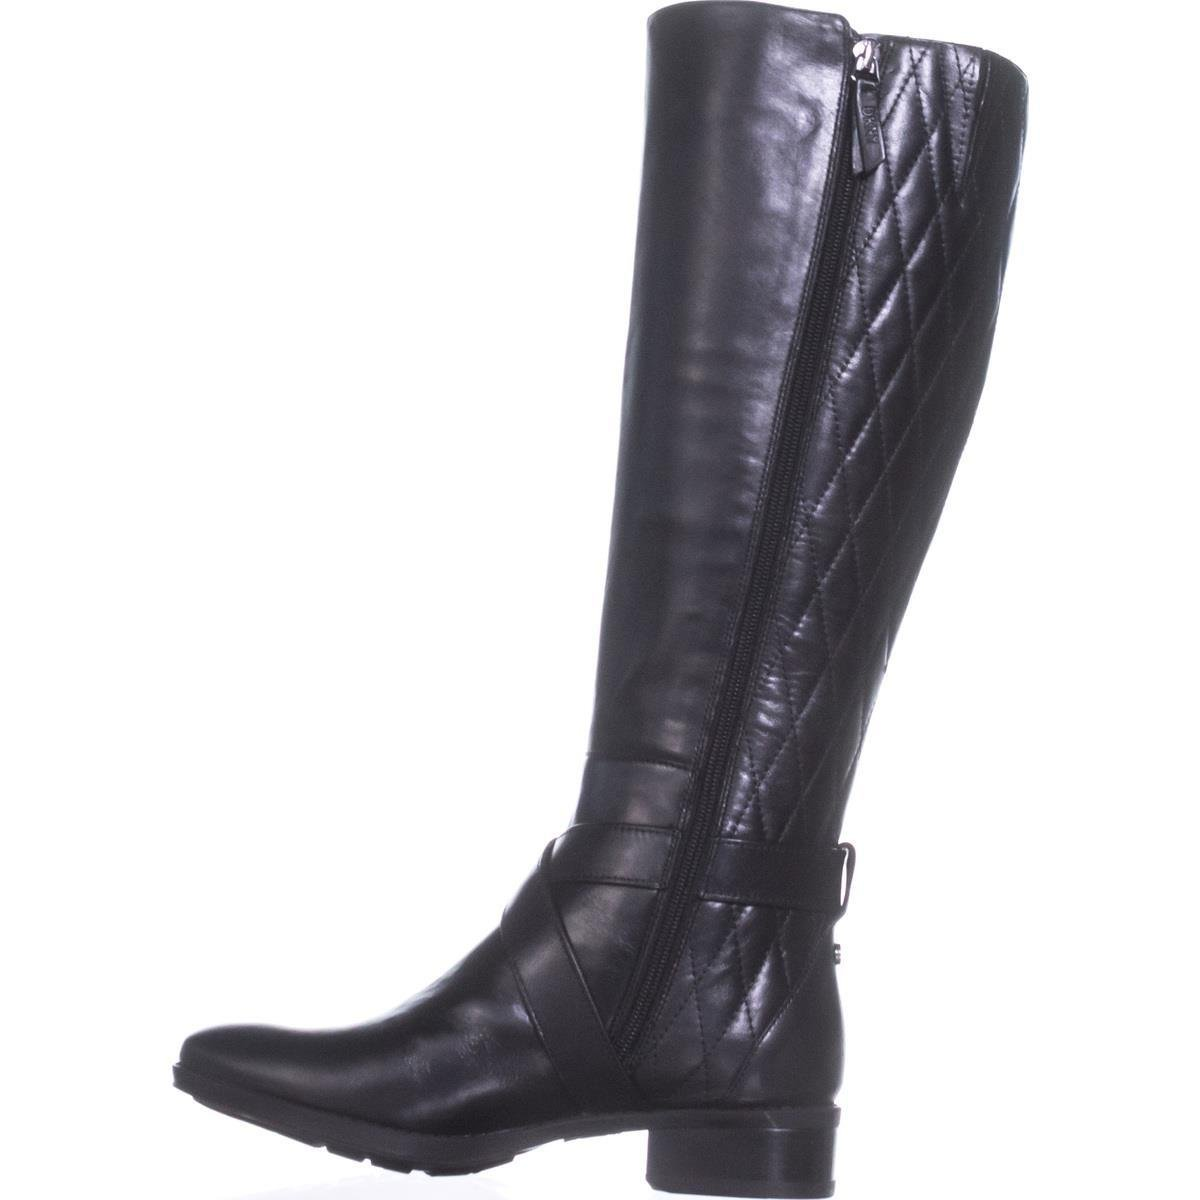 DKNY Frauen Mattie Pumps Rund Leder Leder Leder Fashion Stiefel f0e803